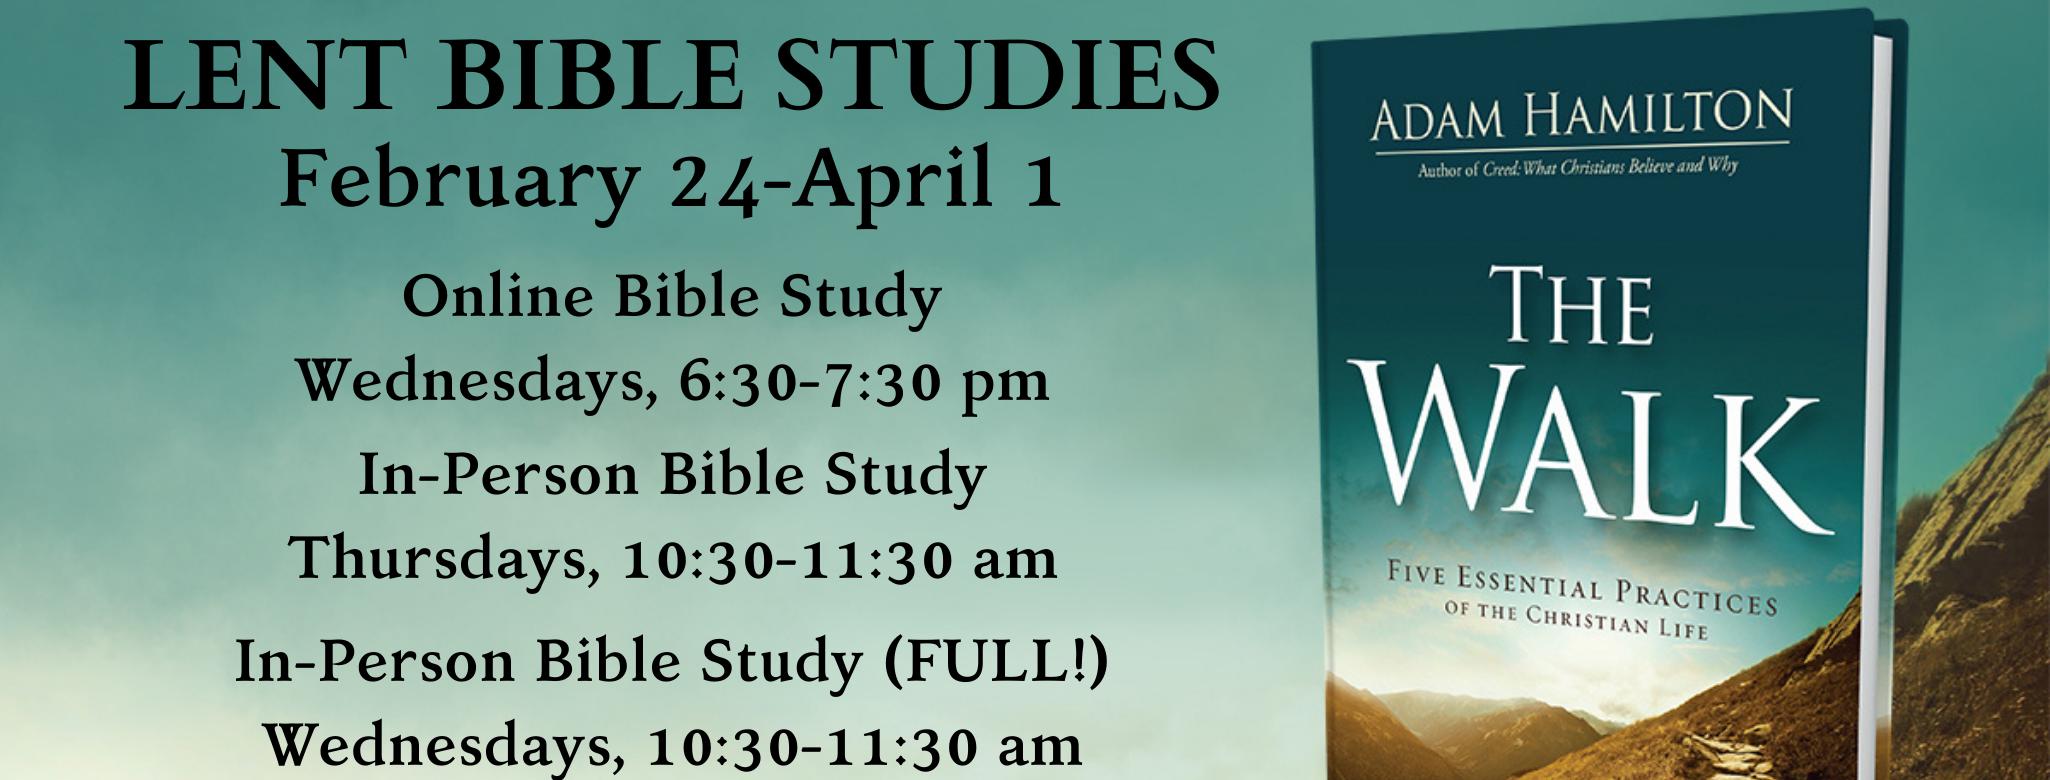 Rev Bible Study image